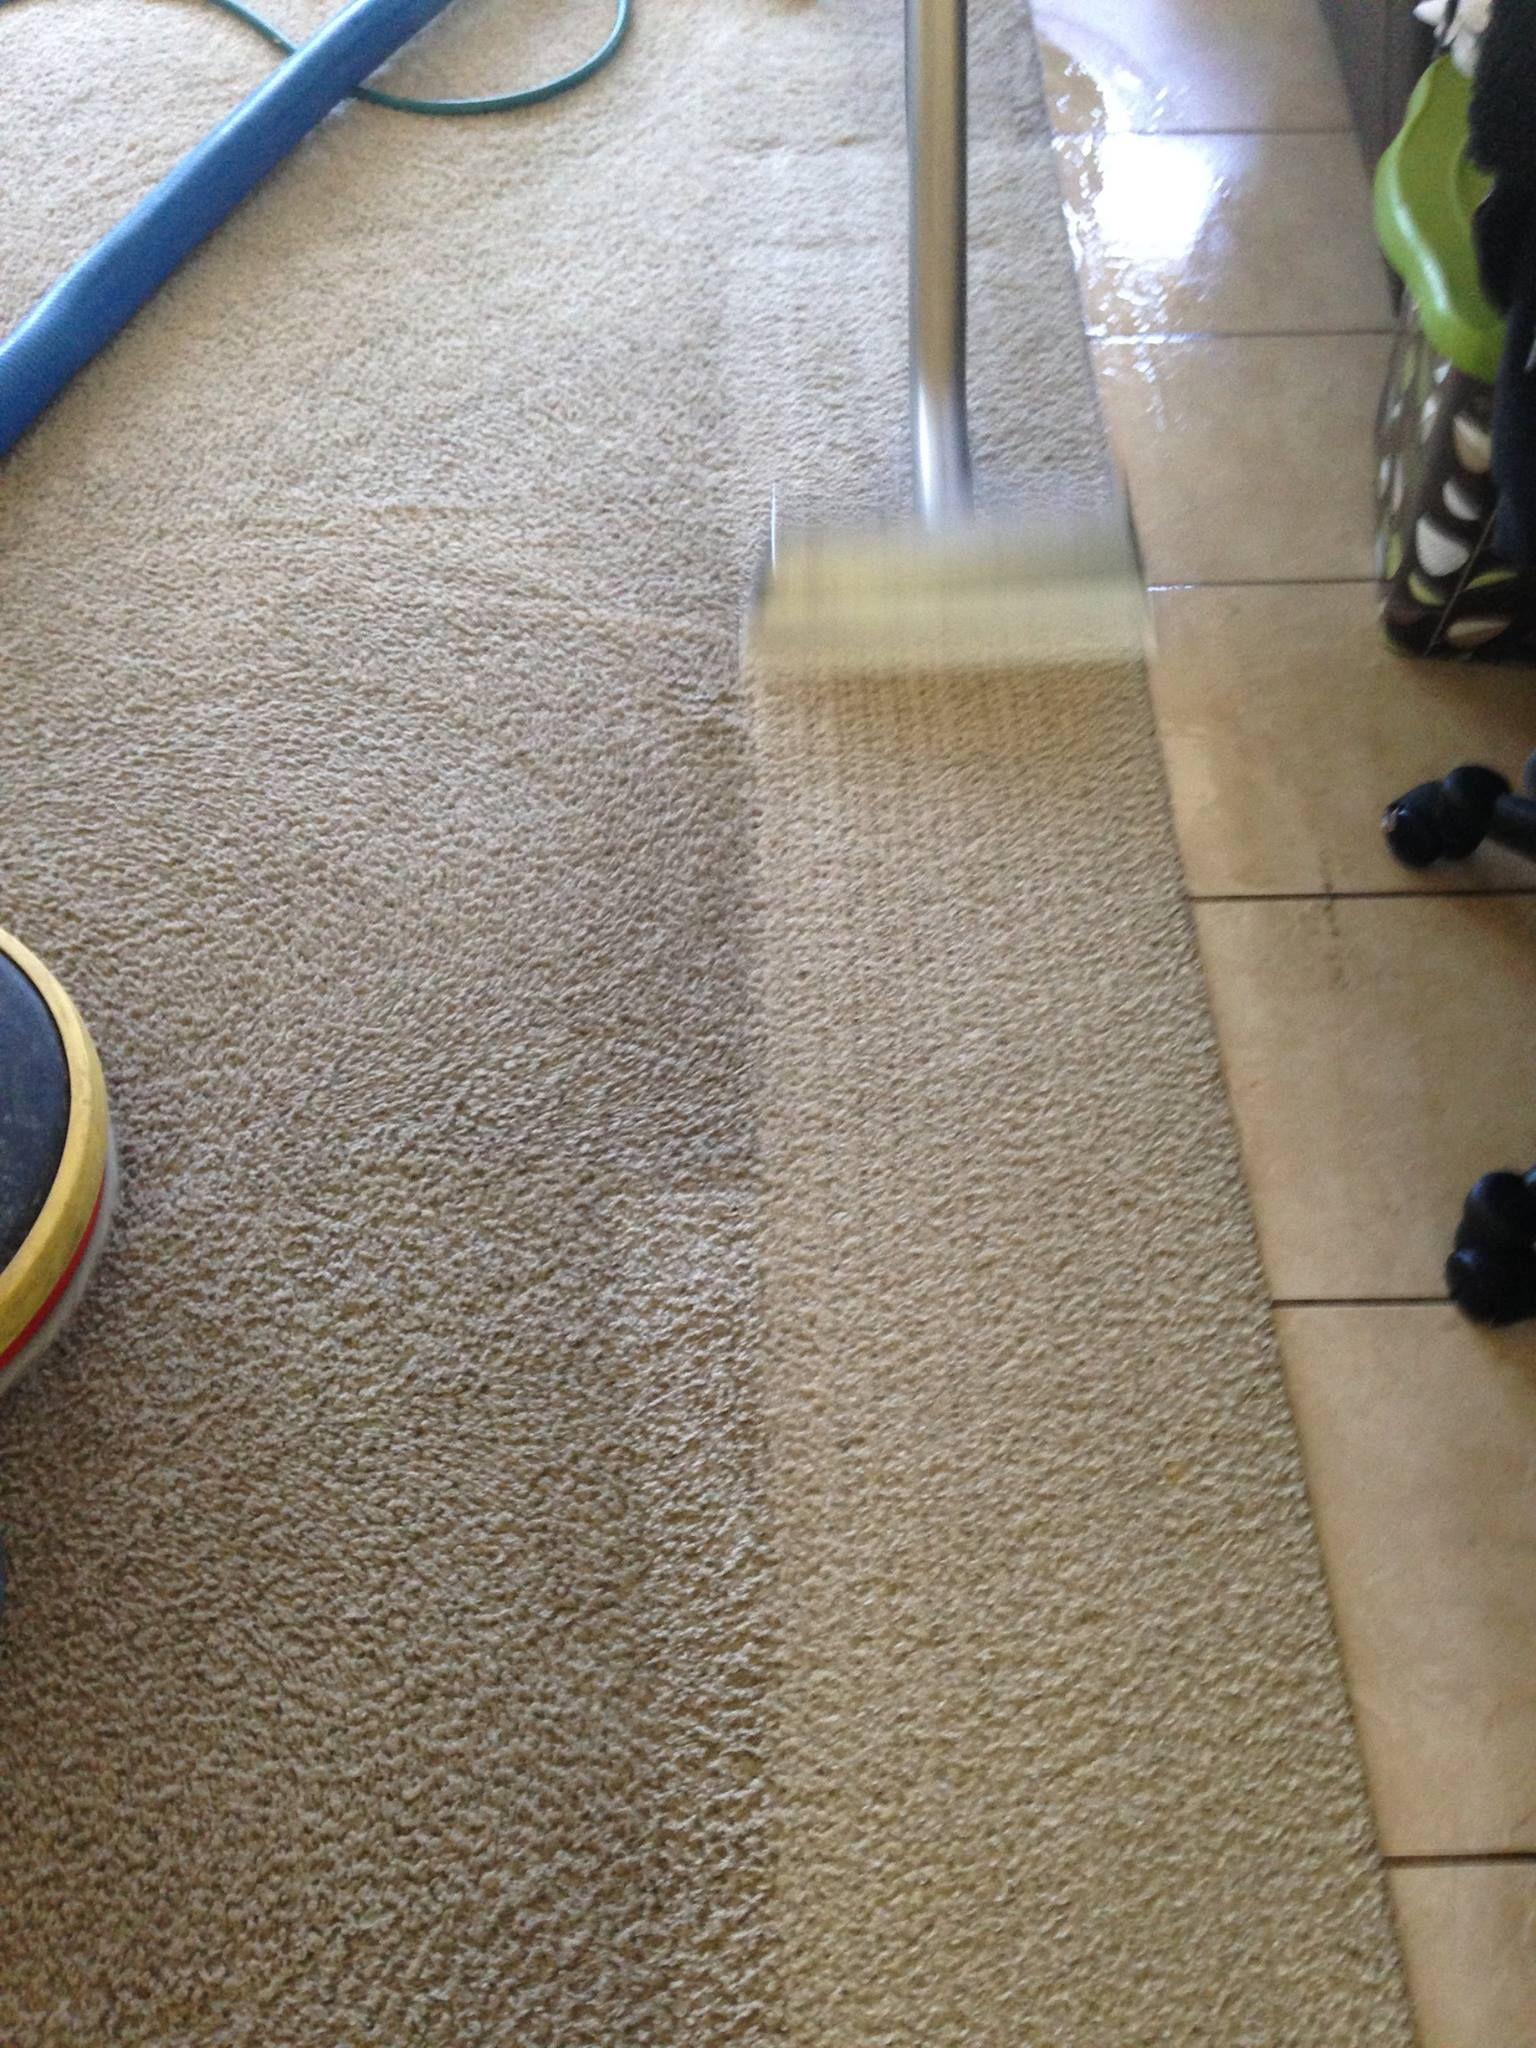 Best Carpet Cleaning In Temecula Ca Feels Free To Follow Us In 2020 How To Clean Carpet Carpet Cleaners Best Carpet